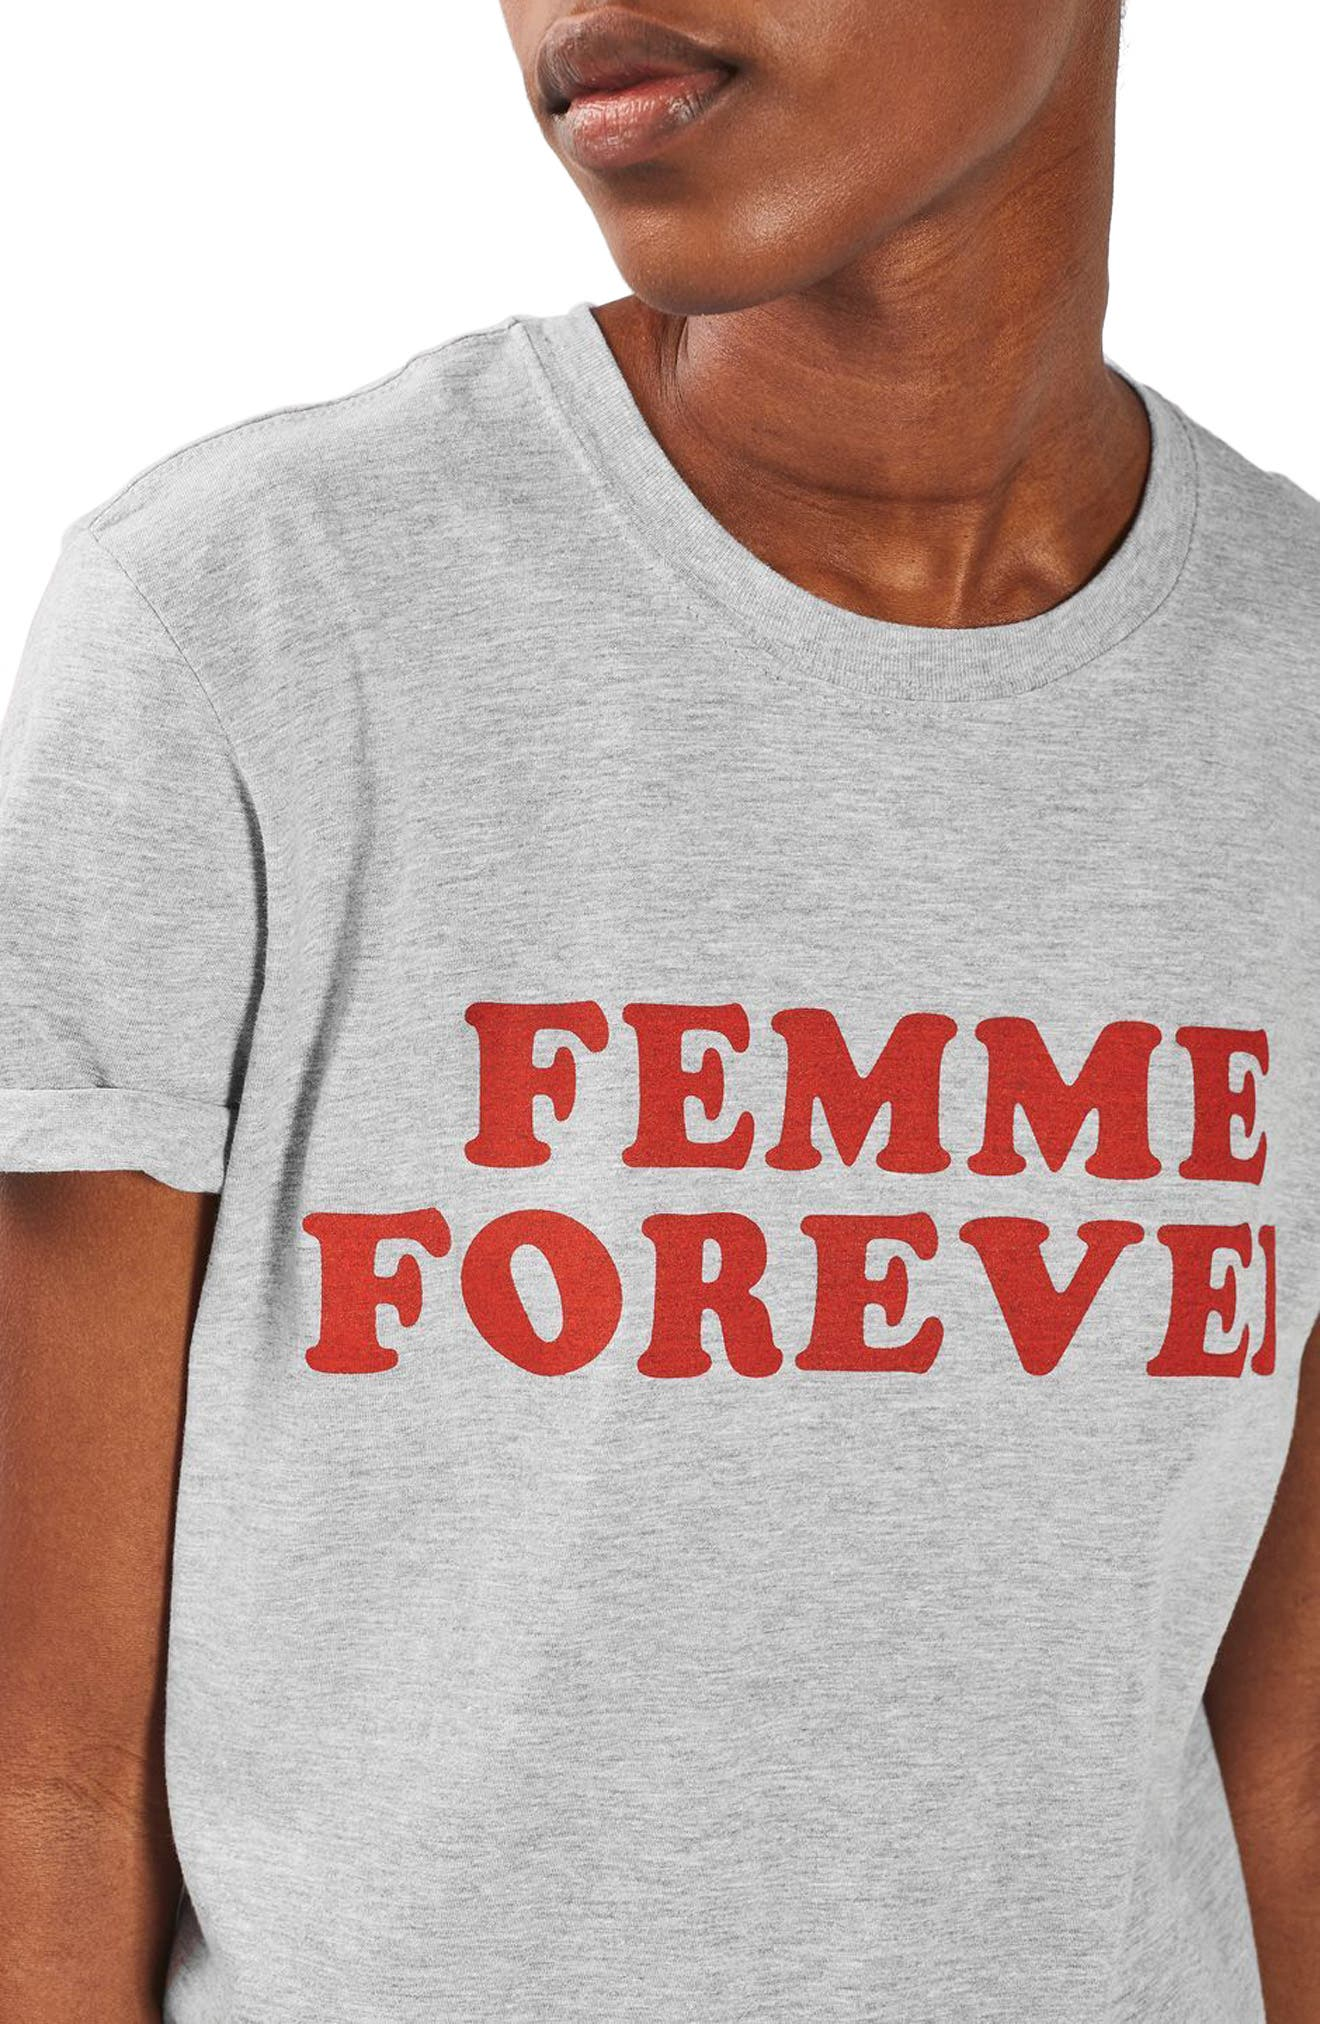 Alternate Image 4  - Topshop Femme Forever Tee